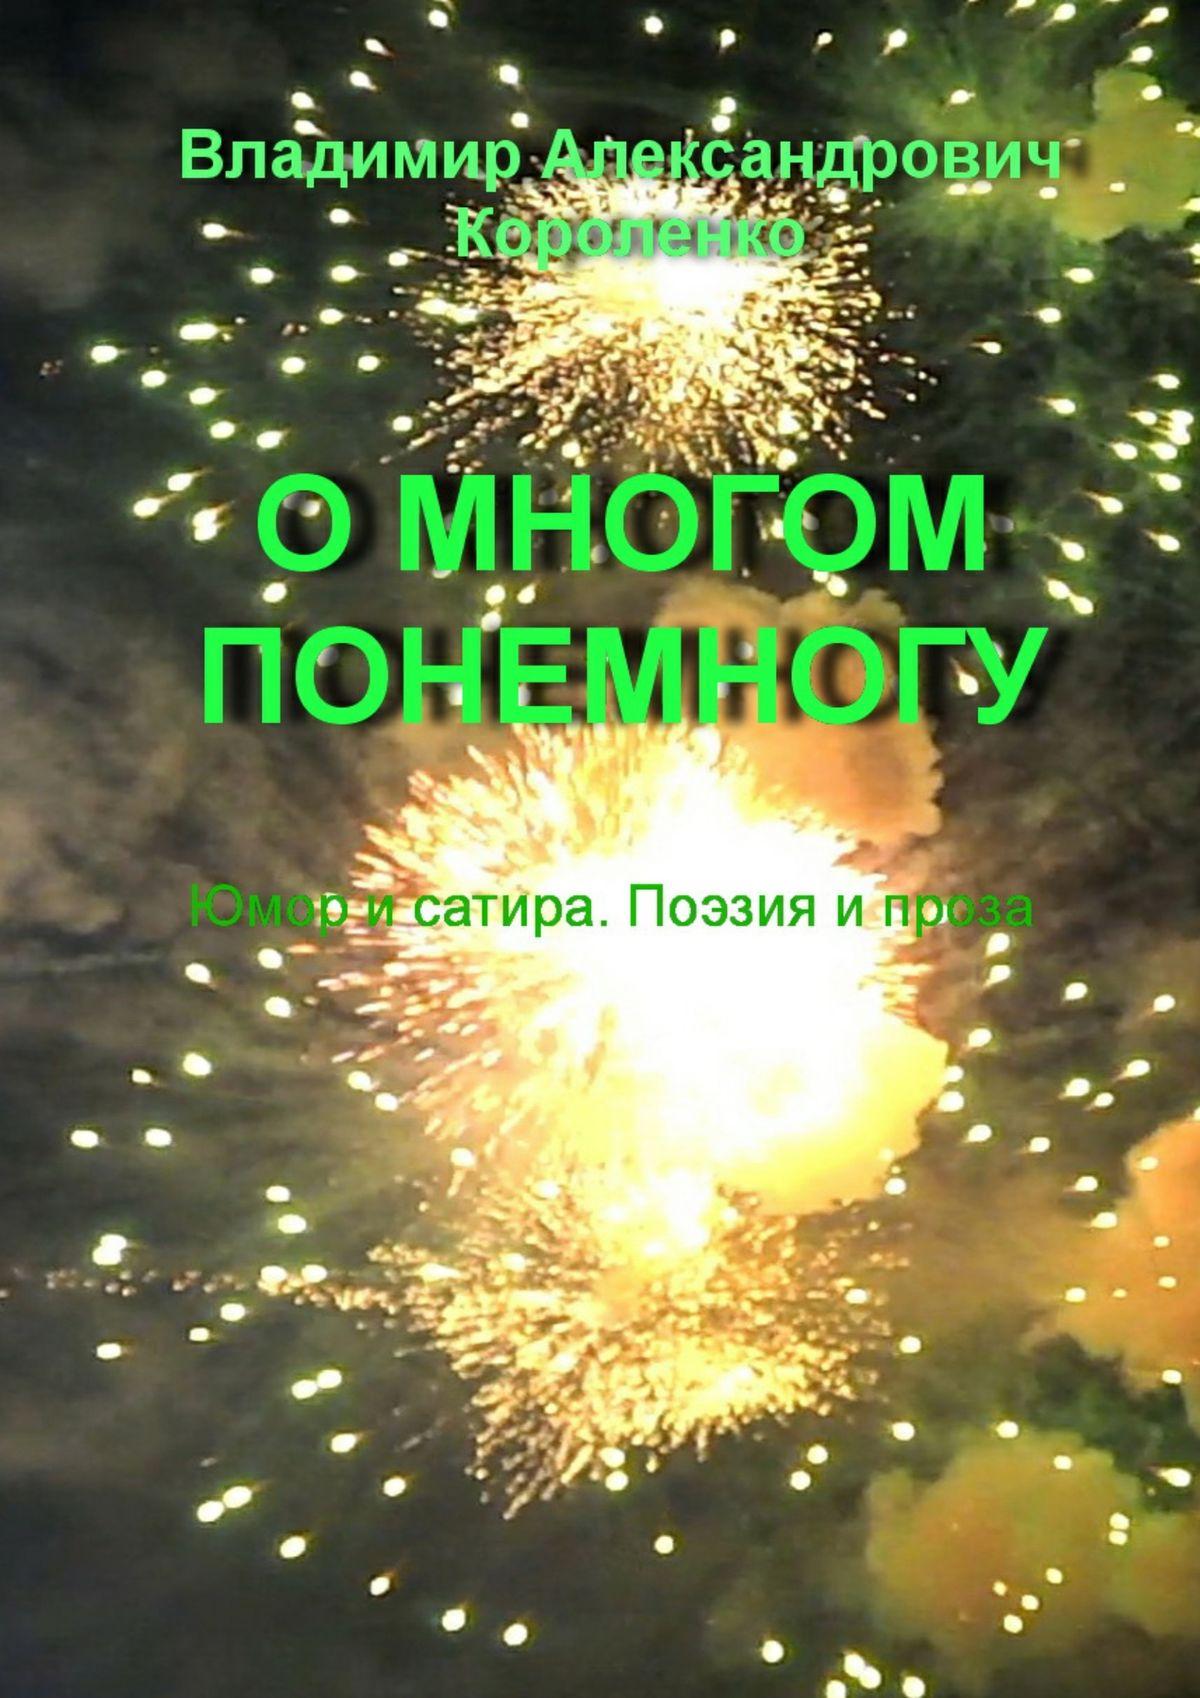 Владимир Александрович Короленко О многом понемногу арман кишкембаев понемногу омногом мозаика моей жизни